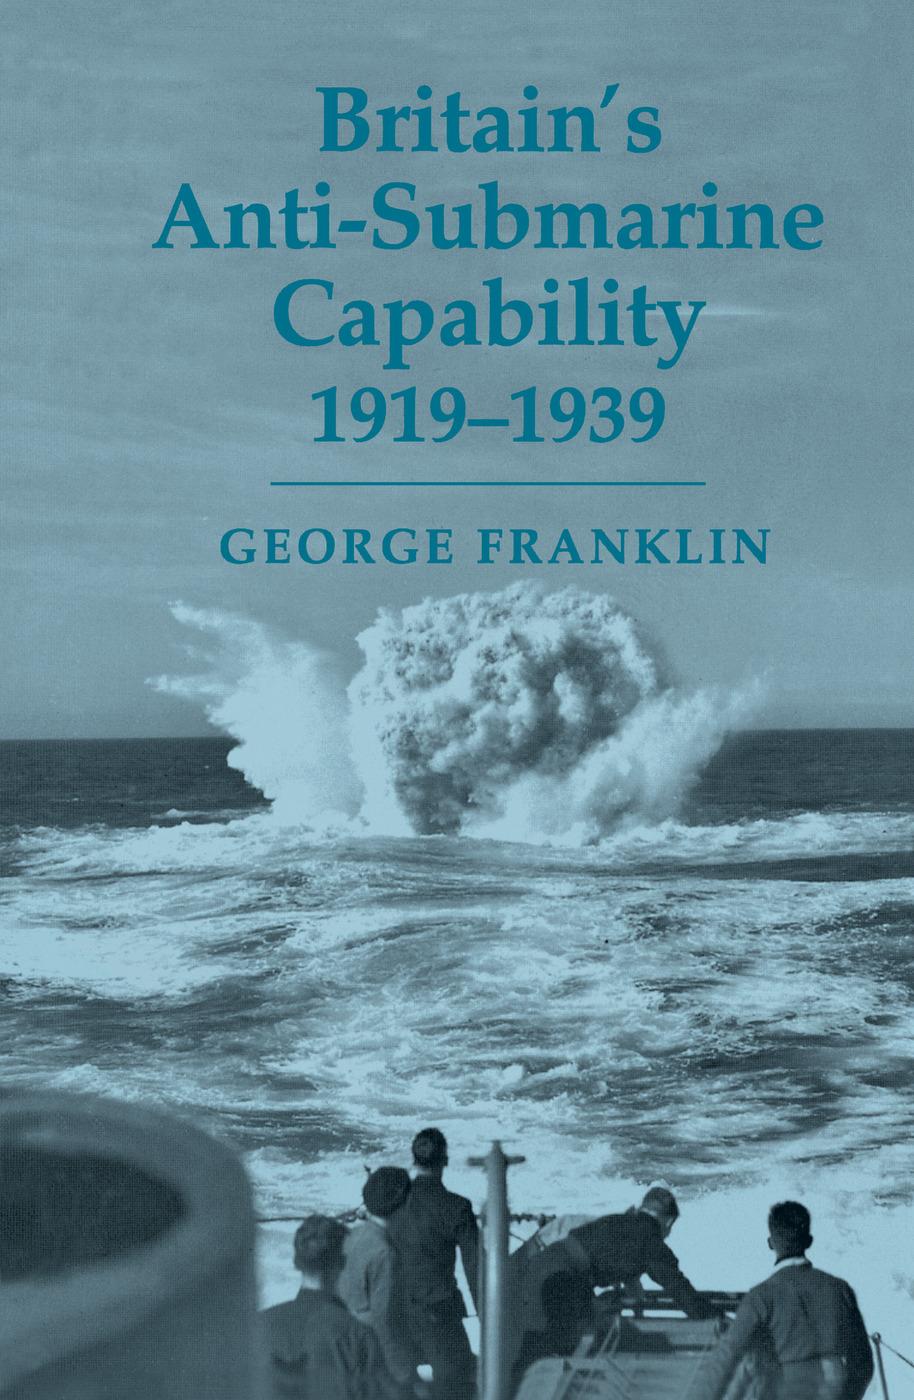 Britain's Anti-submarine Capability 1919-1939